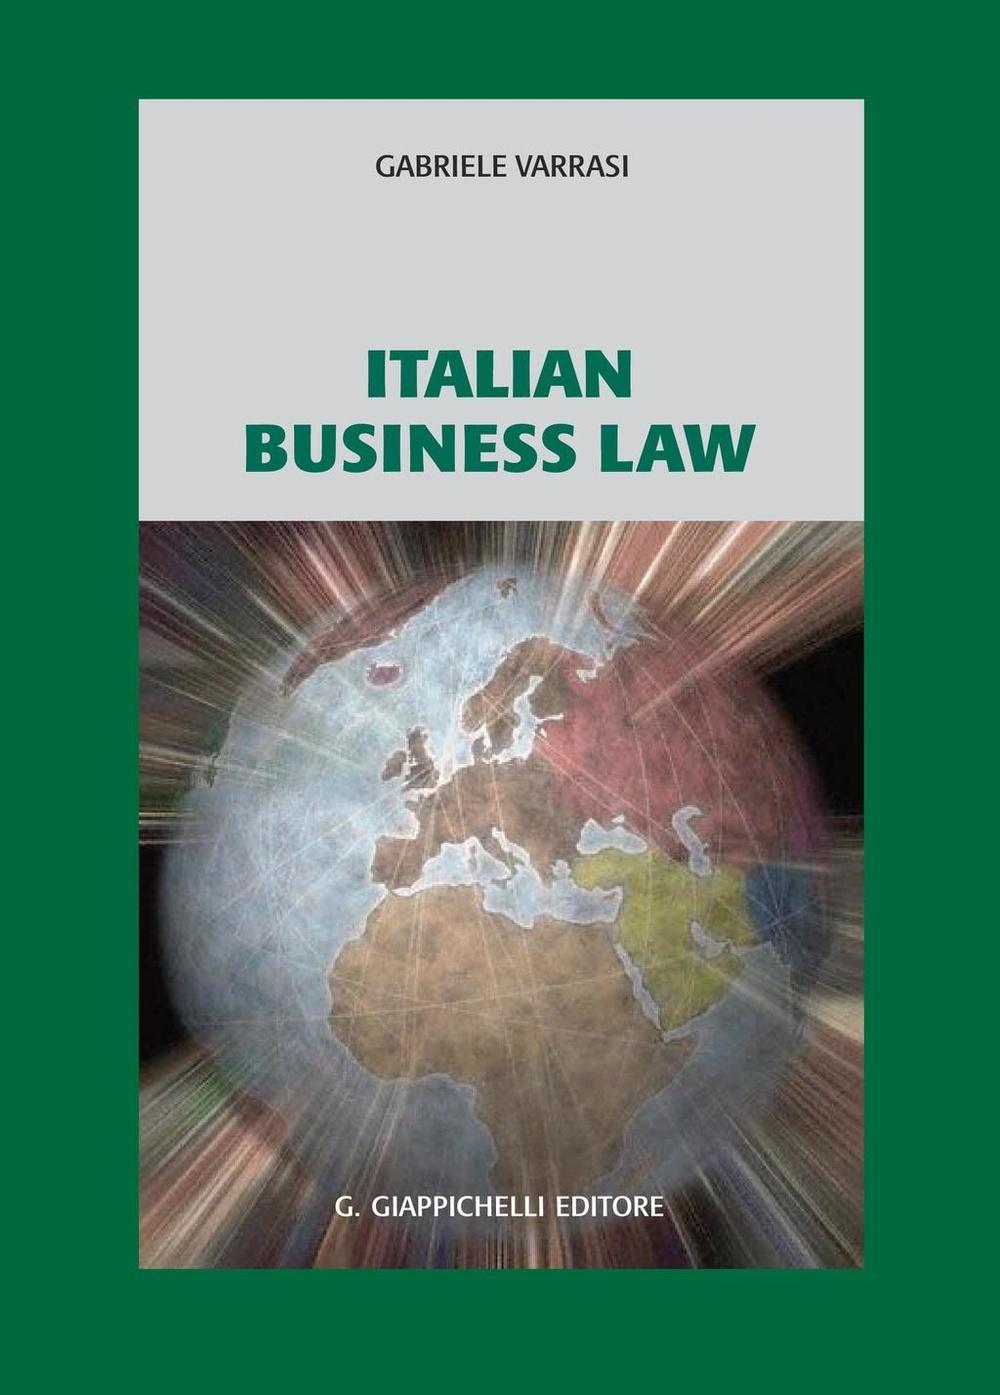 Italian business law.